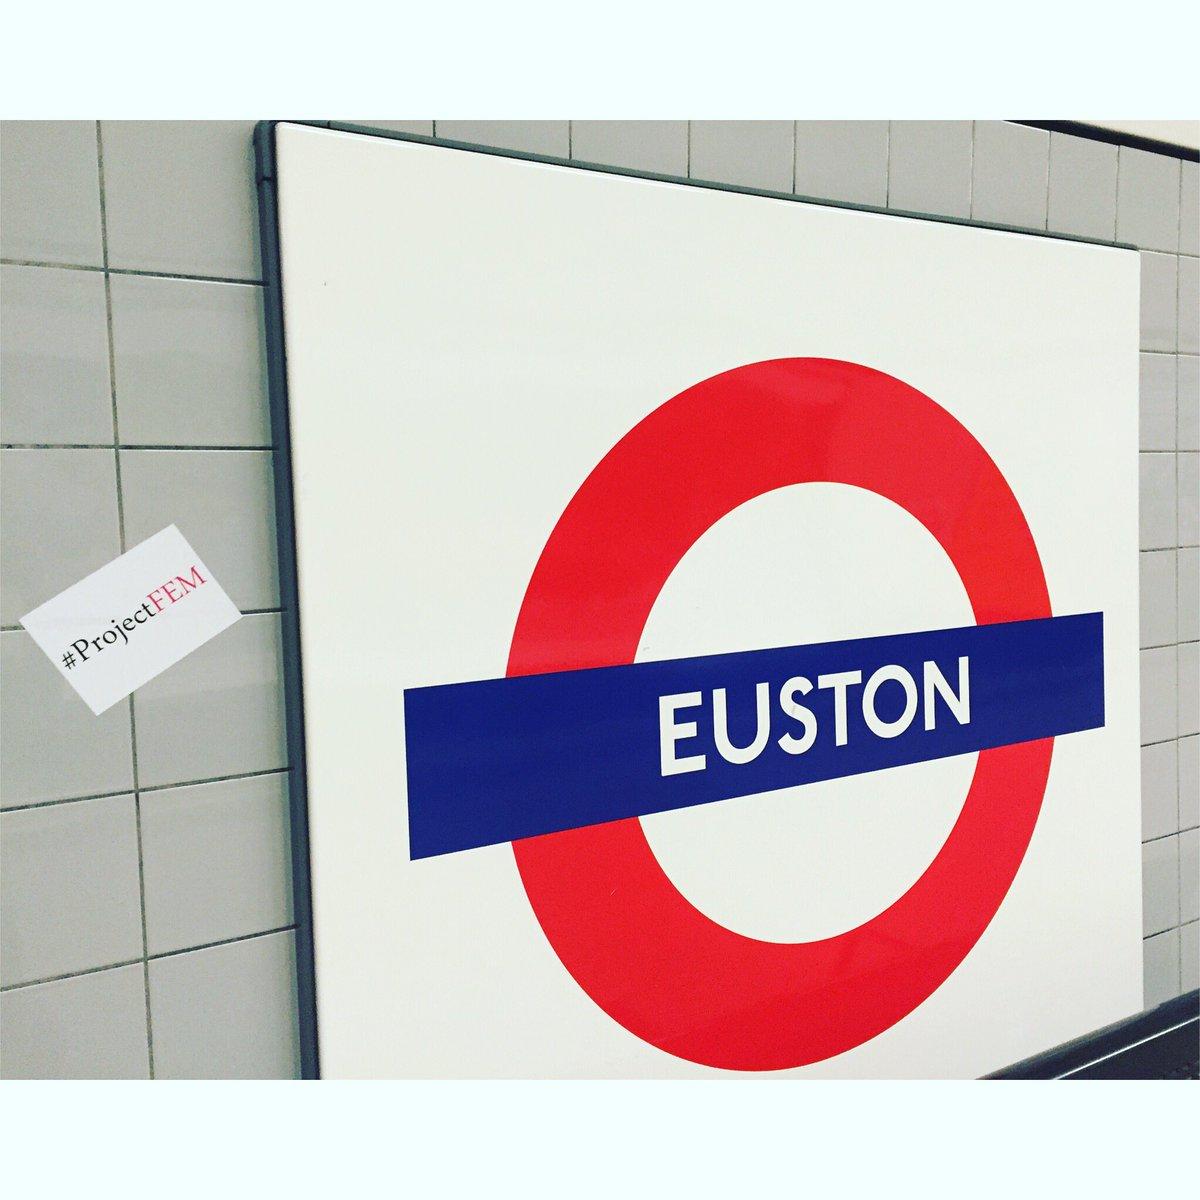 ✊🏼💋 #ProjectFEM #London #Euston #socialaction #socialchange #socialjustice #feminism #fashion #feminist #empowerment